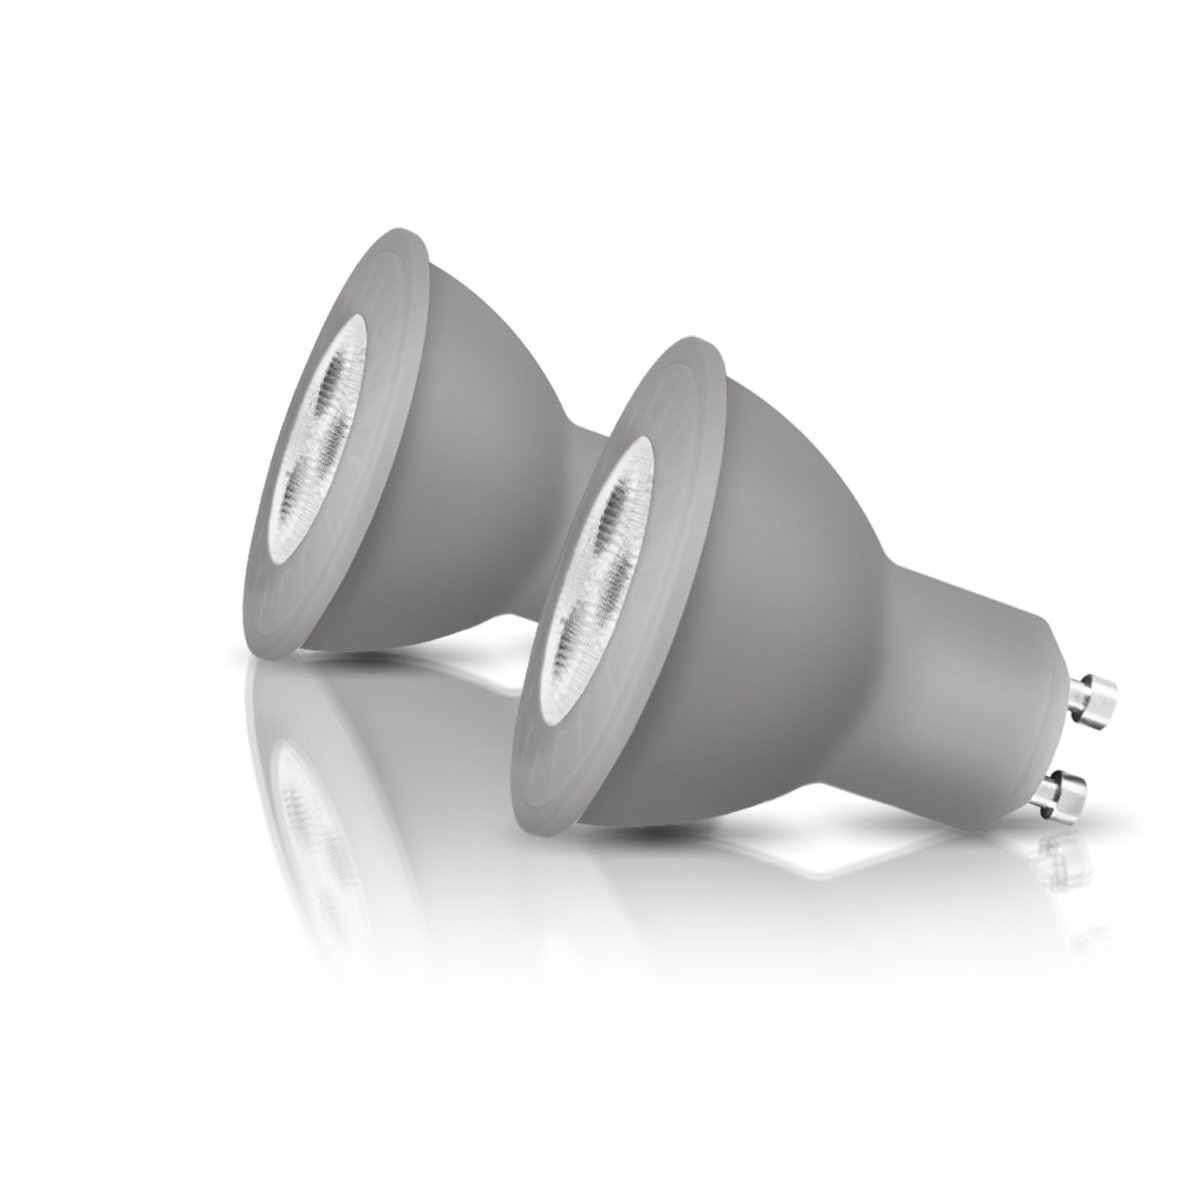 OSRAM LED-Reflektorlampe GU10 Retrofit PAR16 / 4W - 35 Watt-Ersatz, LED-Spot / matt, warmweiß - 2700K, Blister 2er Pack Ledvance 4052899947573